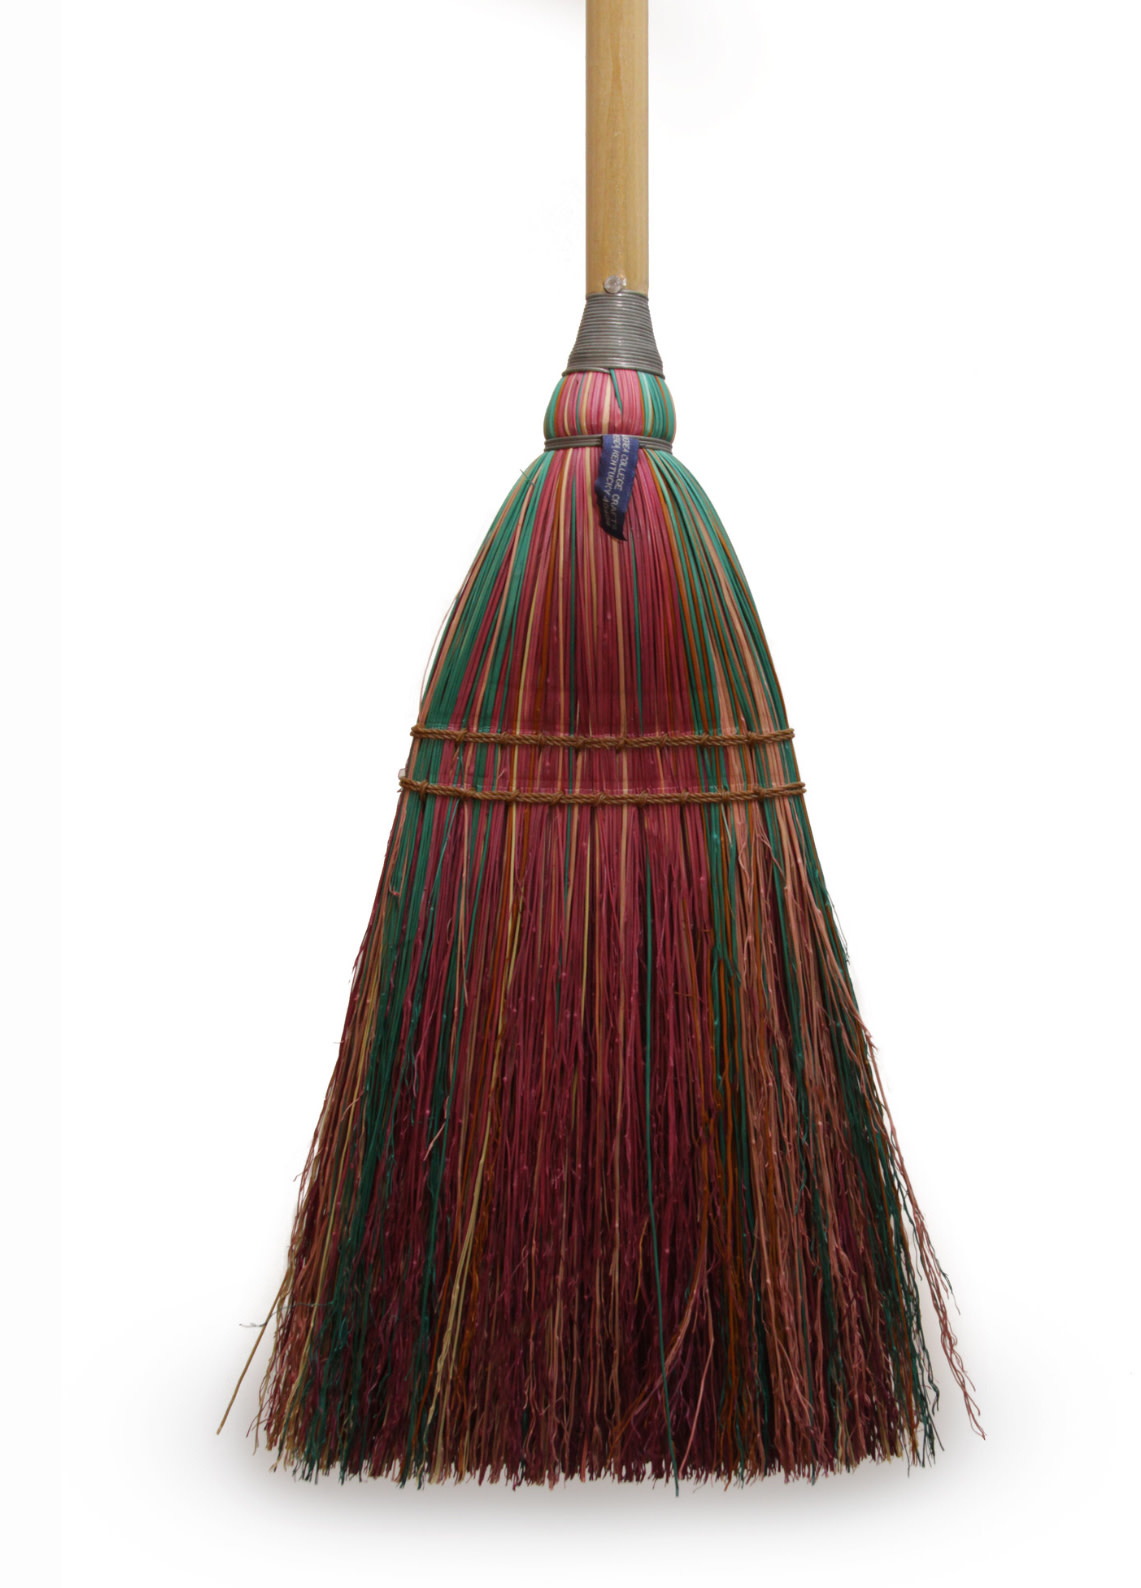 Handy Broom Natural-4